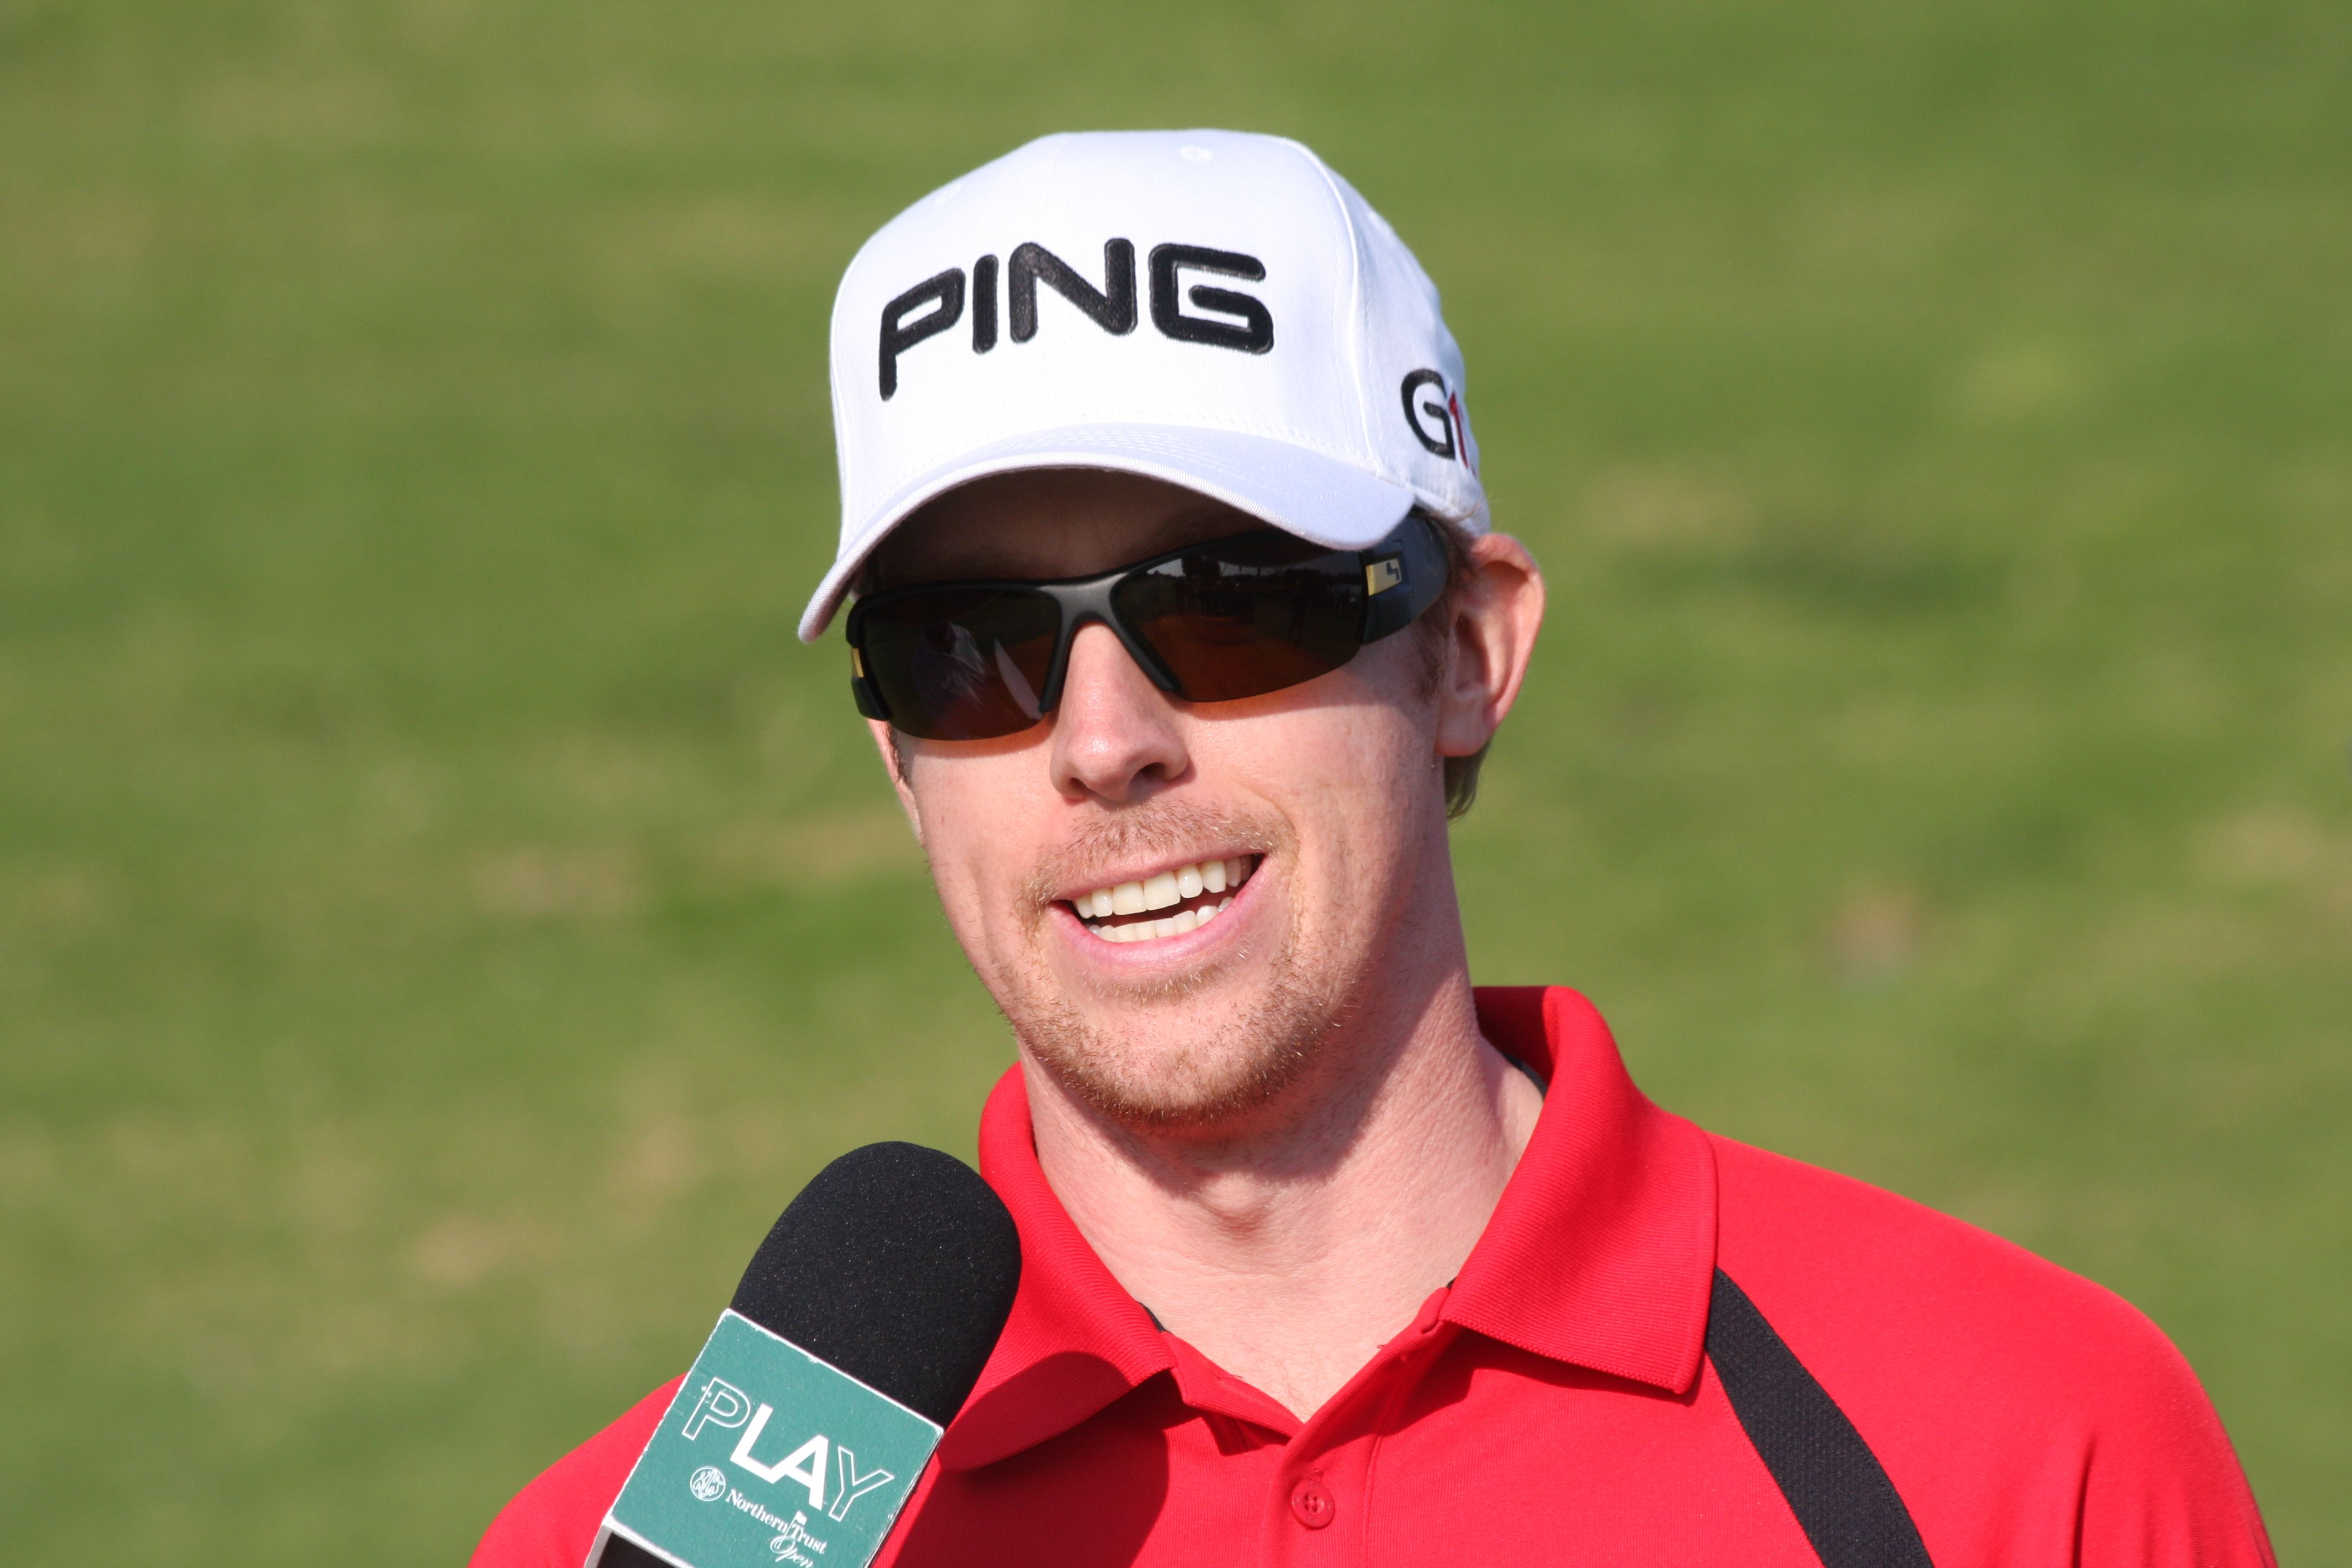 Emily Kuchar Wikipedia Ideal hunter mahan @ judith land   pga golfers   pinterest   golf